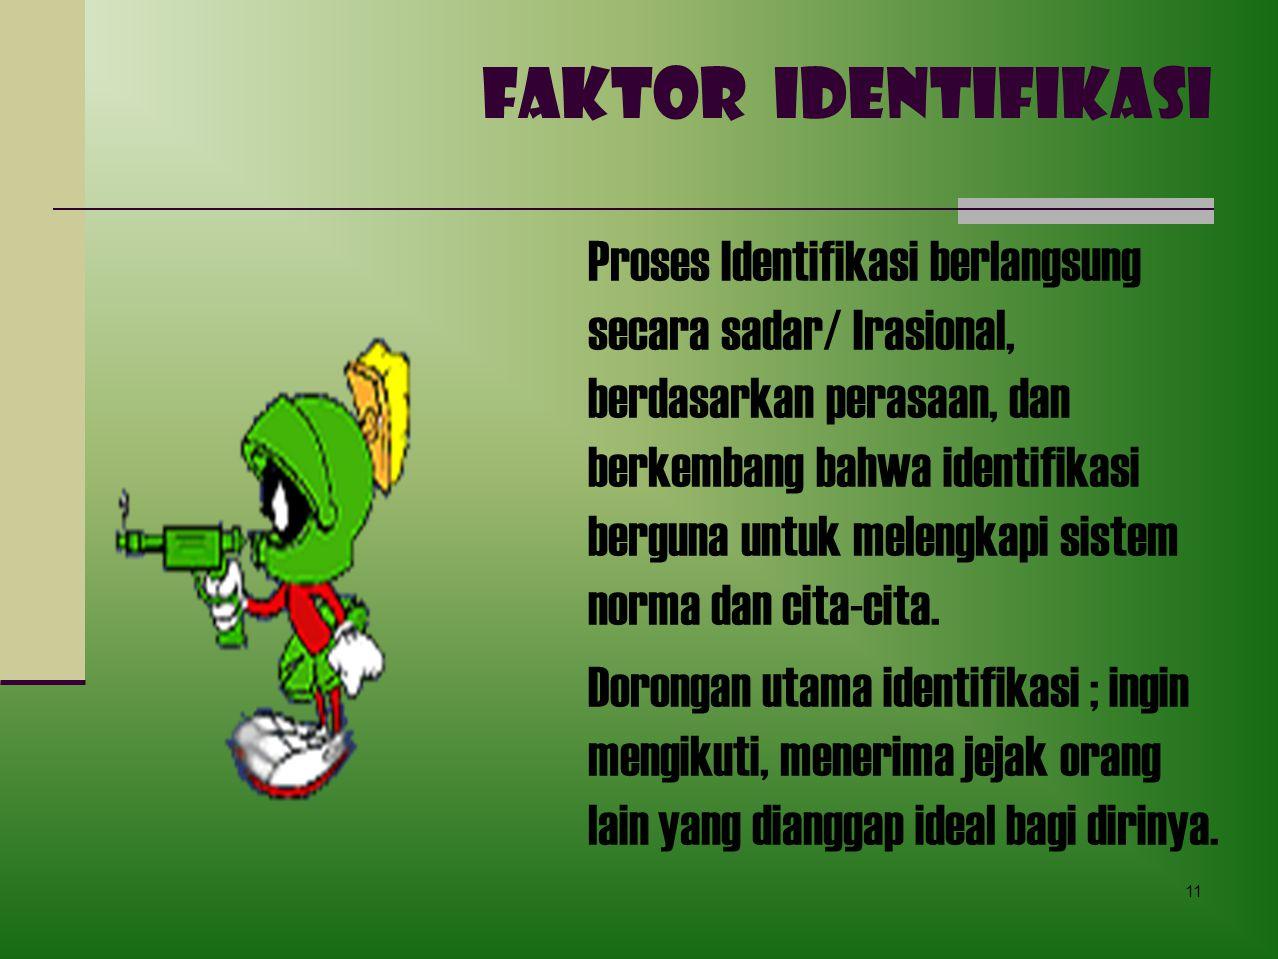 FAKTOR IDENTIFIKASI